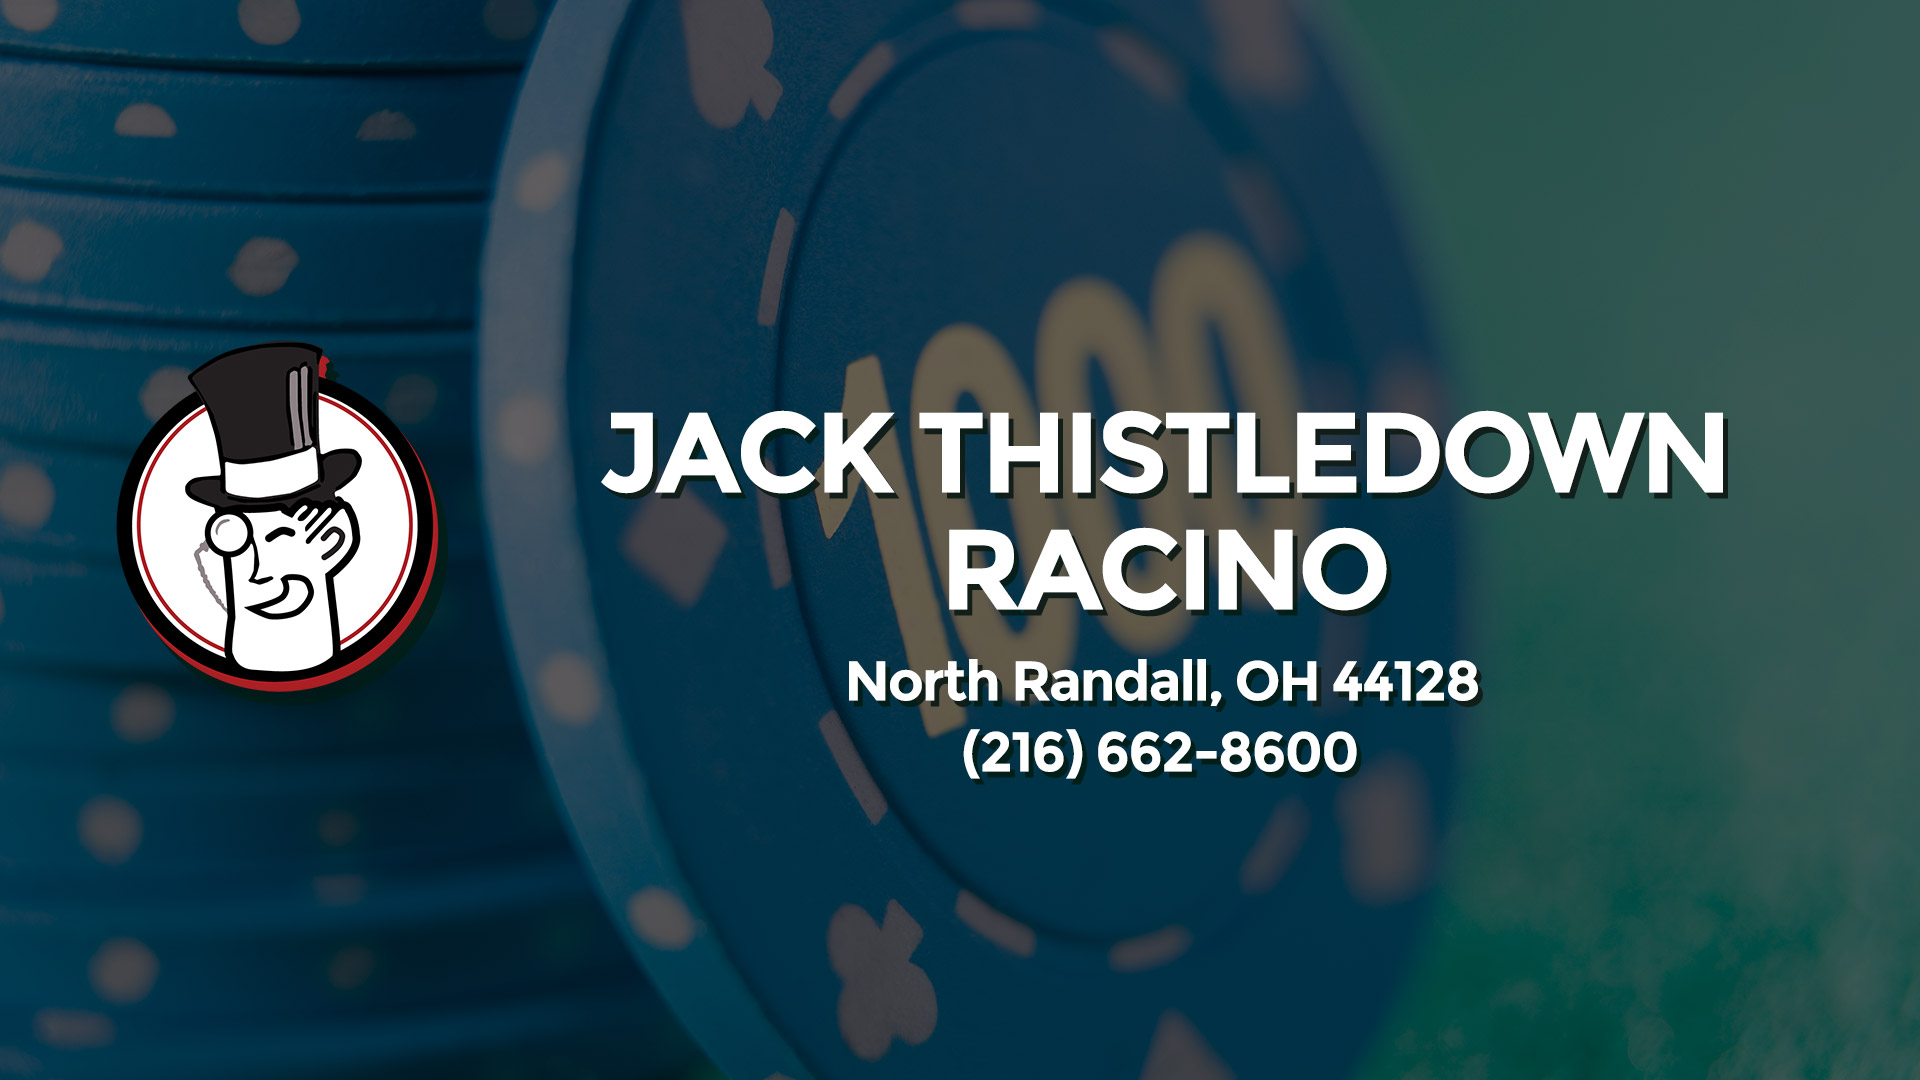 JACK THISTLEDOWN RACINO NORTH RANDALL OH